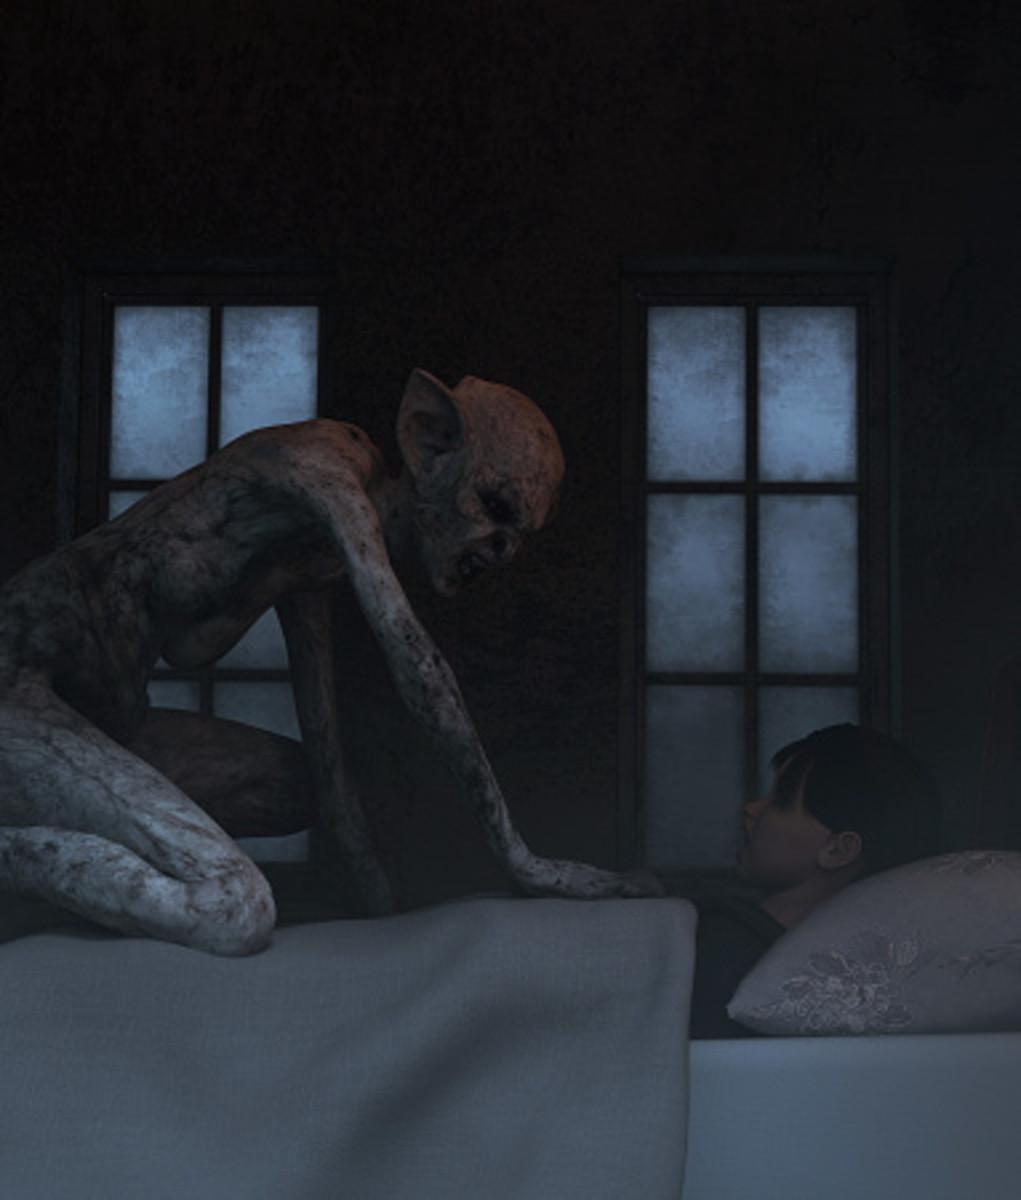 something-in-the-house-sleep-paralysis-demon-or-waking-nightmare